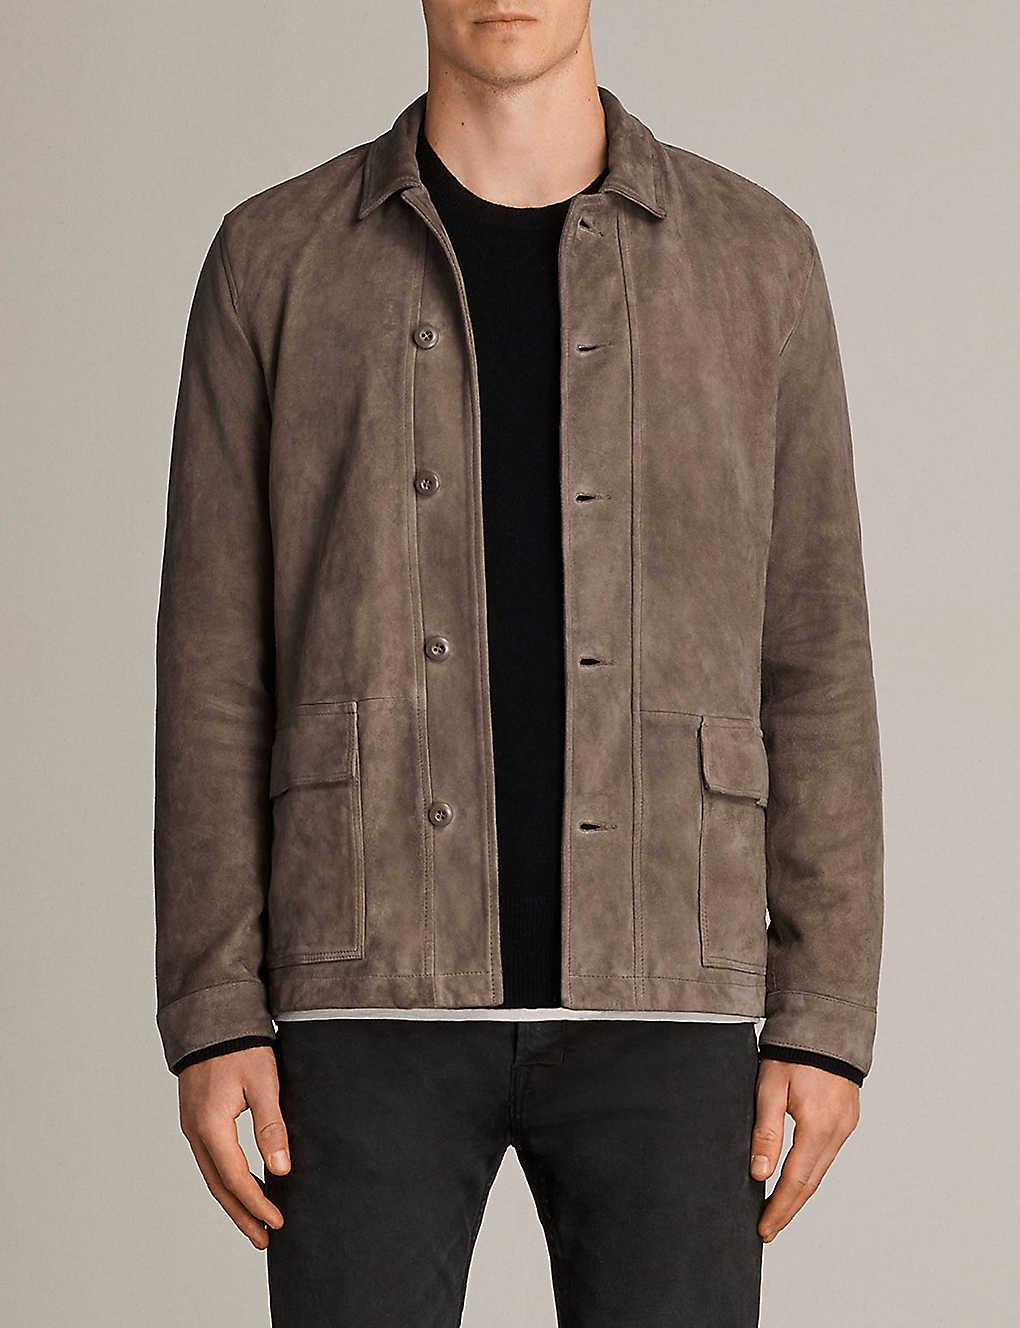 aa971d1ca62f ALLSAINTS - Satter suede jacket | Selfridges.com